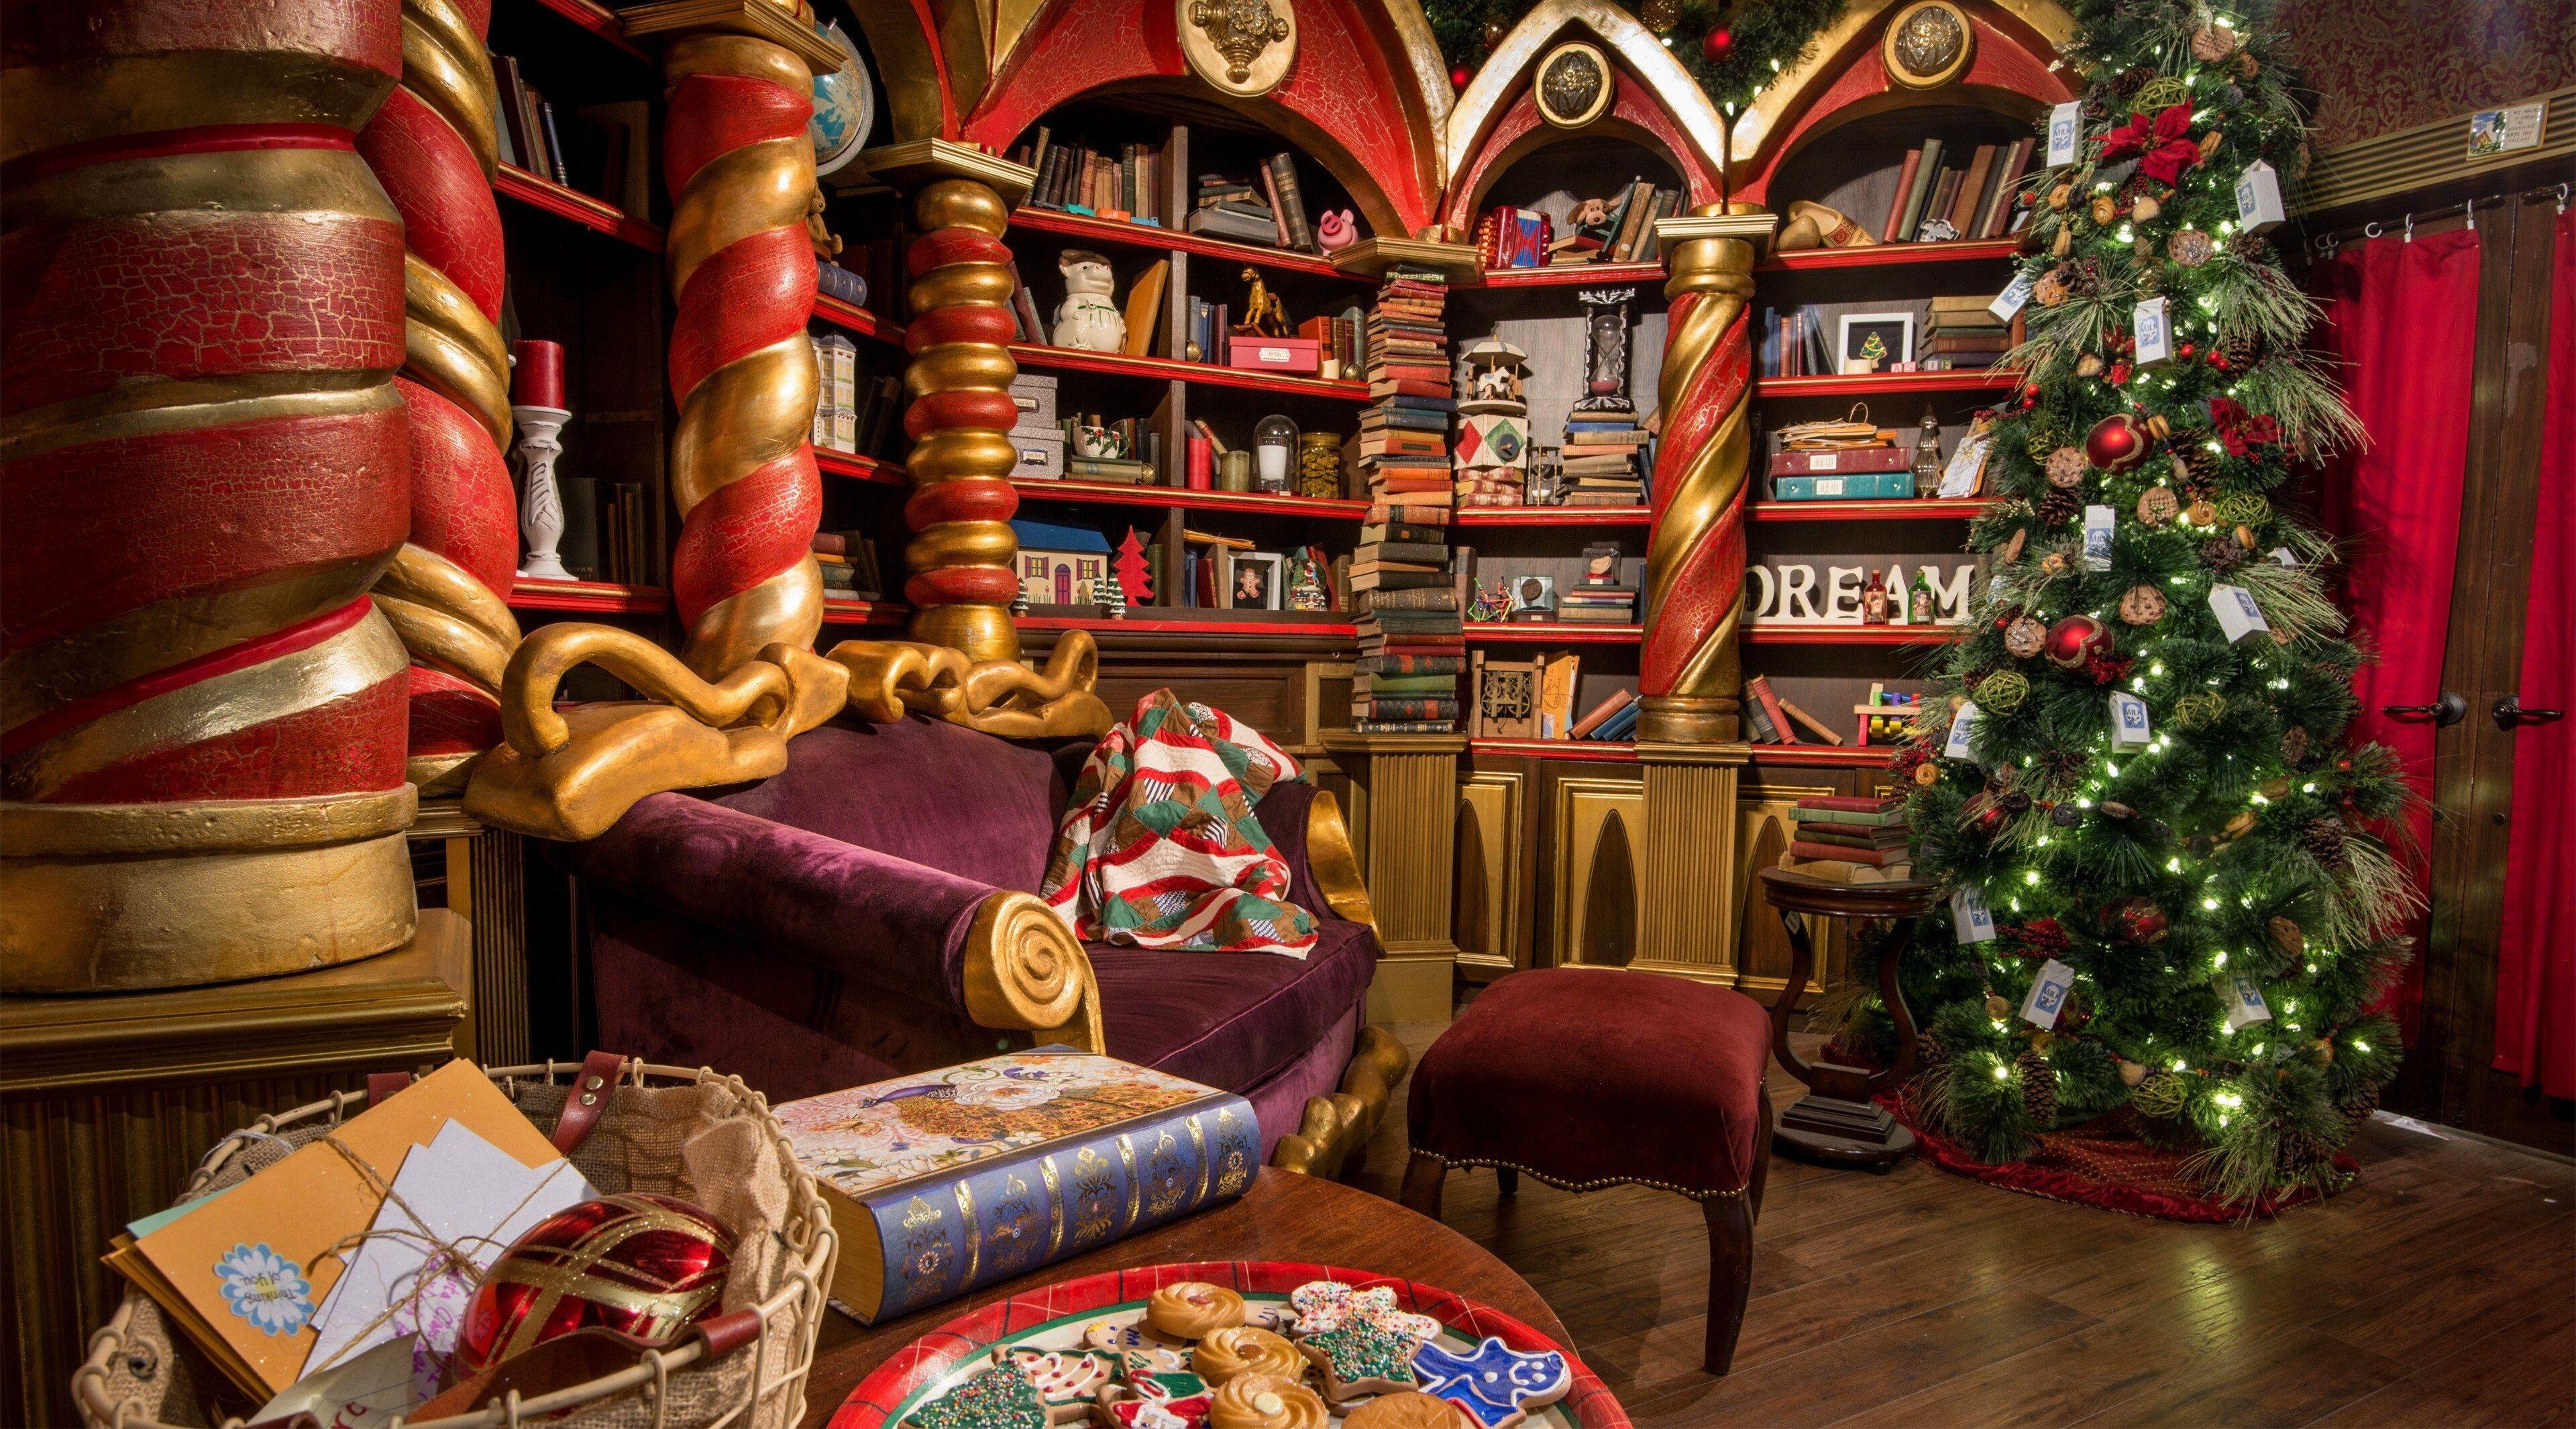 3840x2130 Christmas 4k Wallpaper Hd Background Santas Workshop Santa Experience North Pole Santa S Workshop